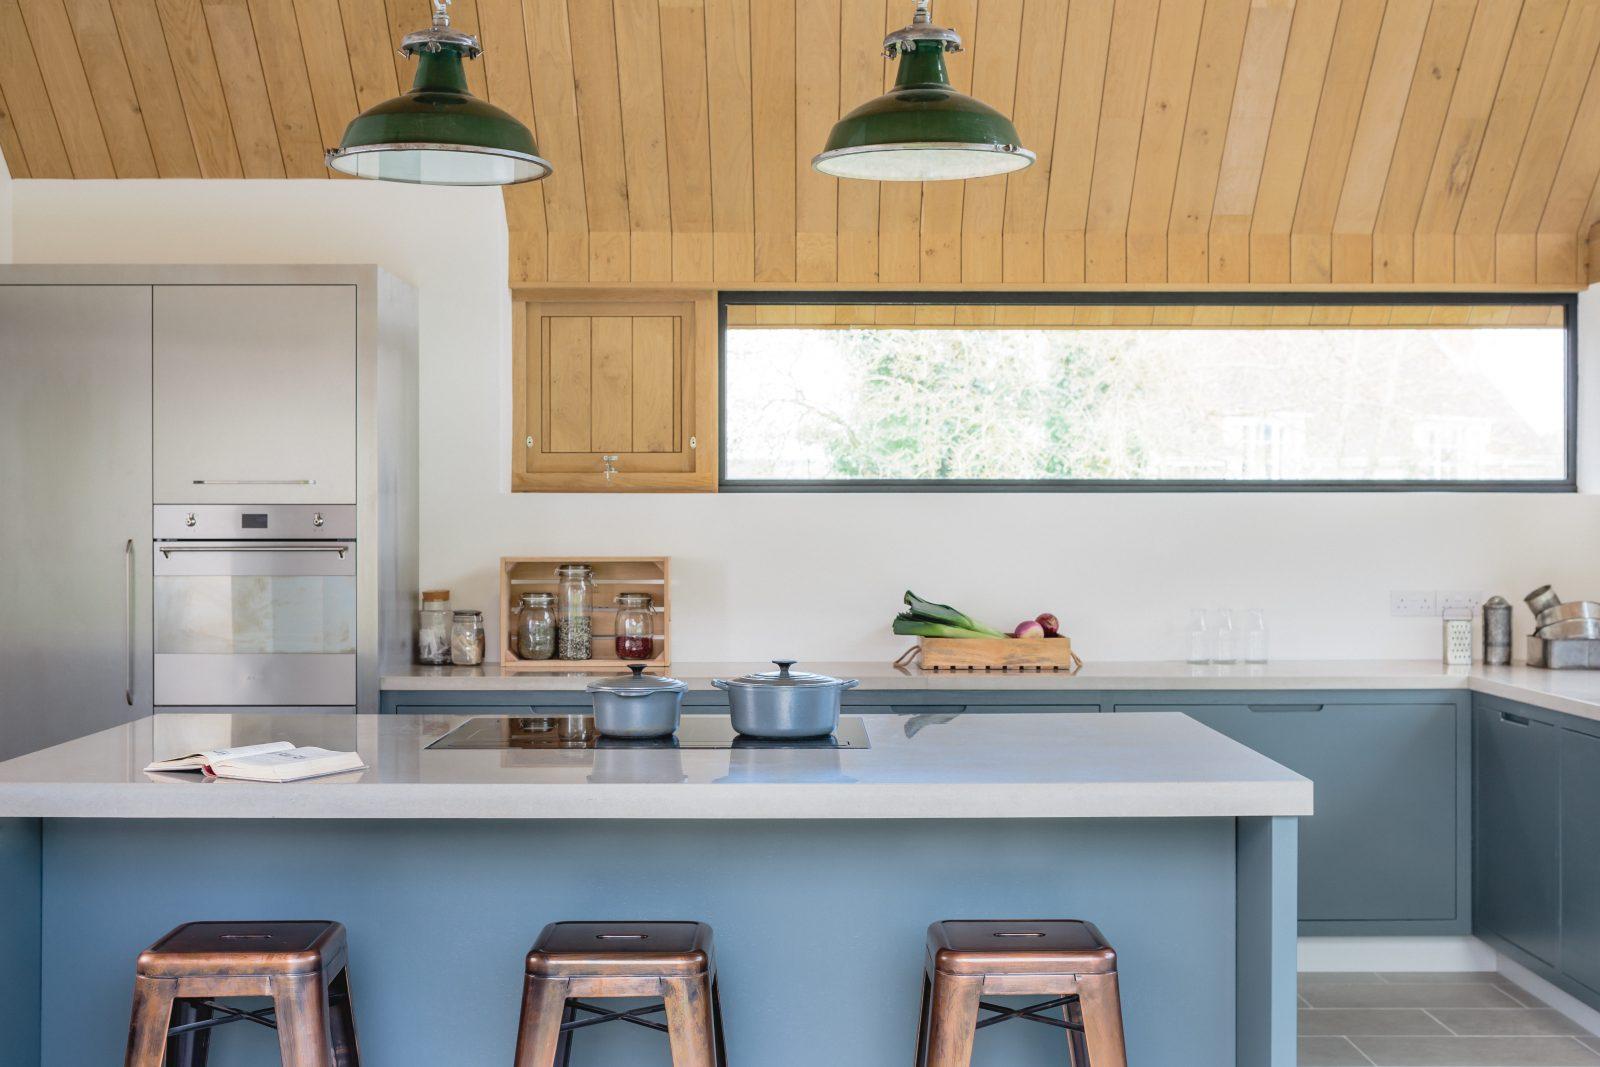 Island breakfast bar in a flat panel oak kitchen with polished concrete worktops